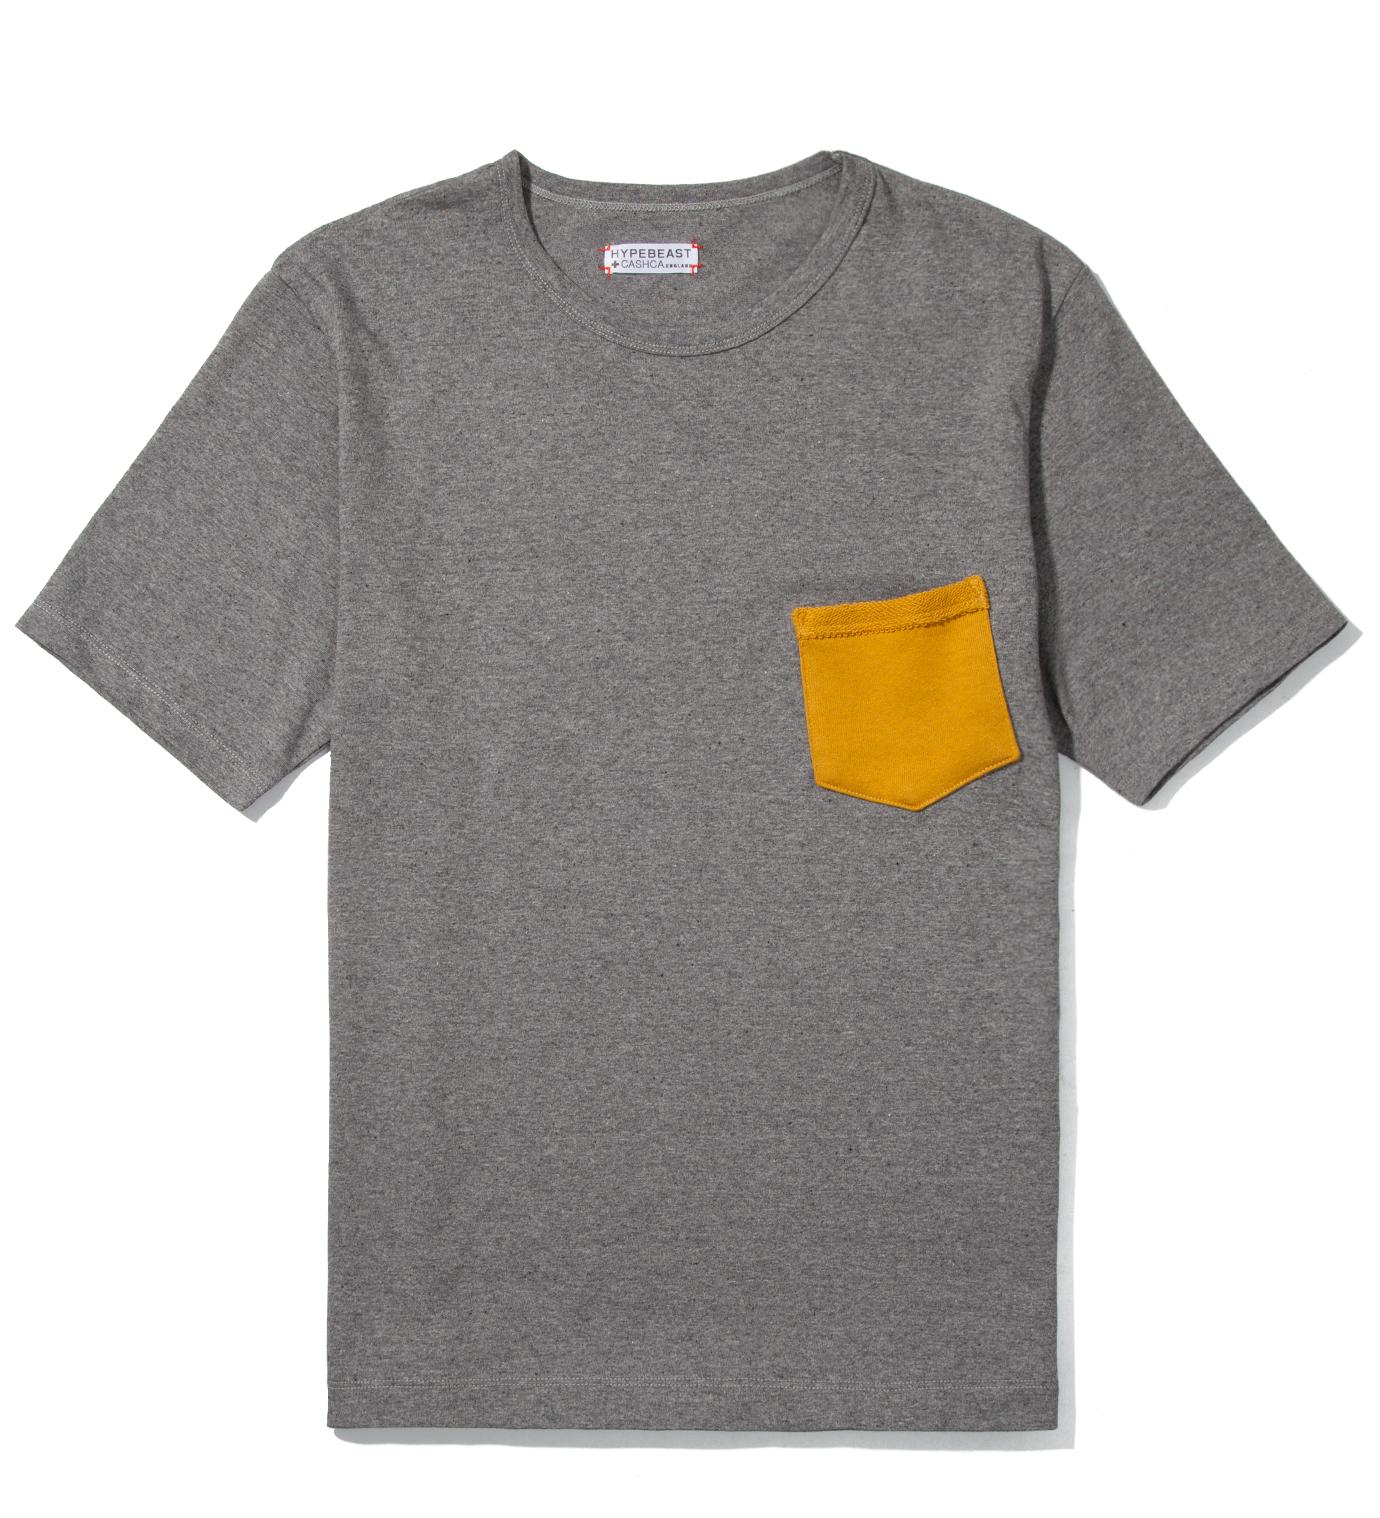 CASH CA Cash Ca for Hypebeast Charcoal Pocket T-Shirt